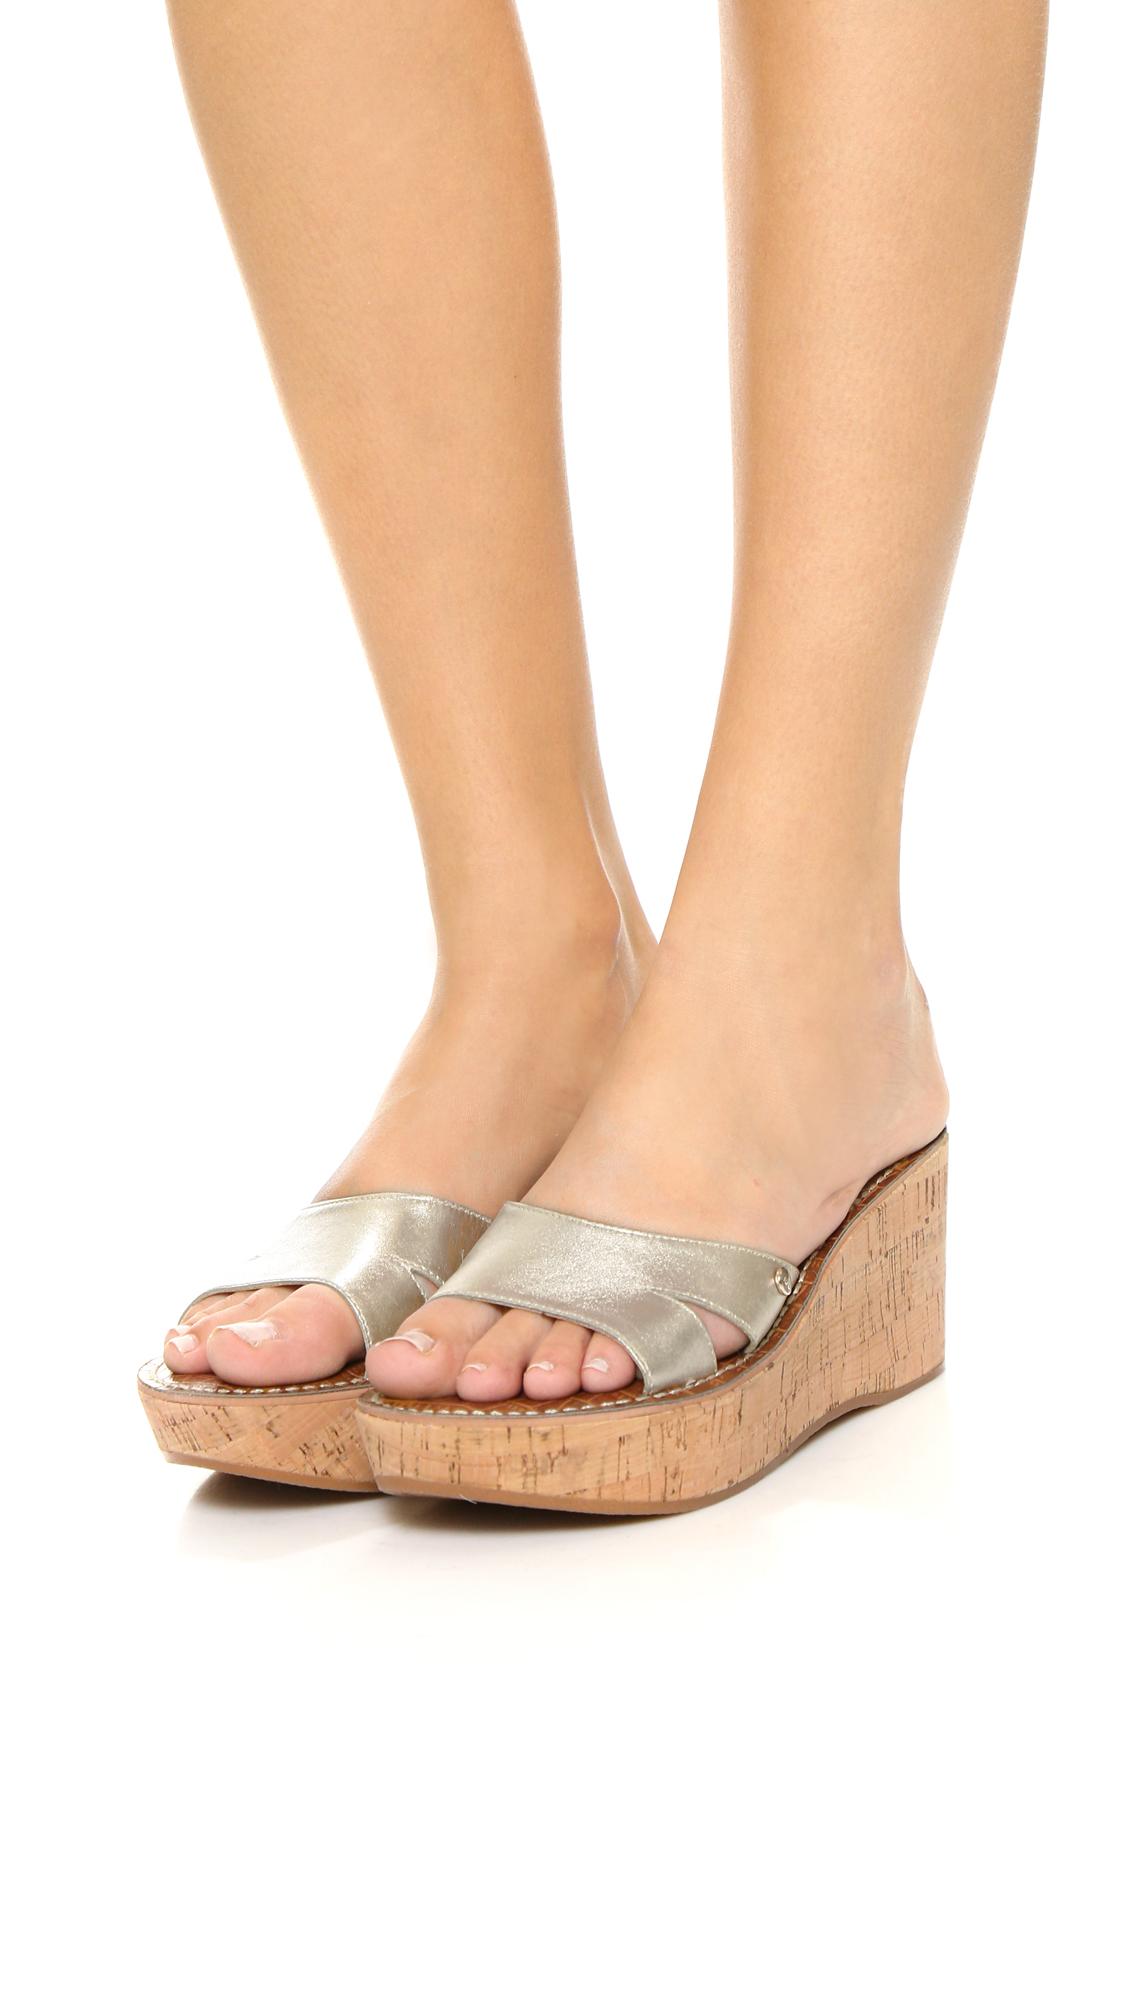 d30f19b036d5 Sam Edelman Reid Wedge Sandals